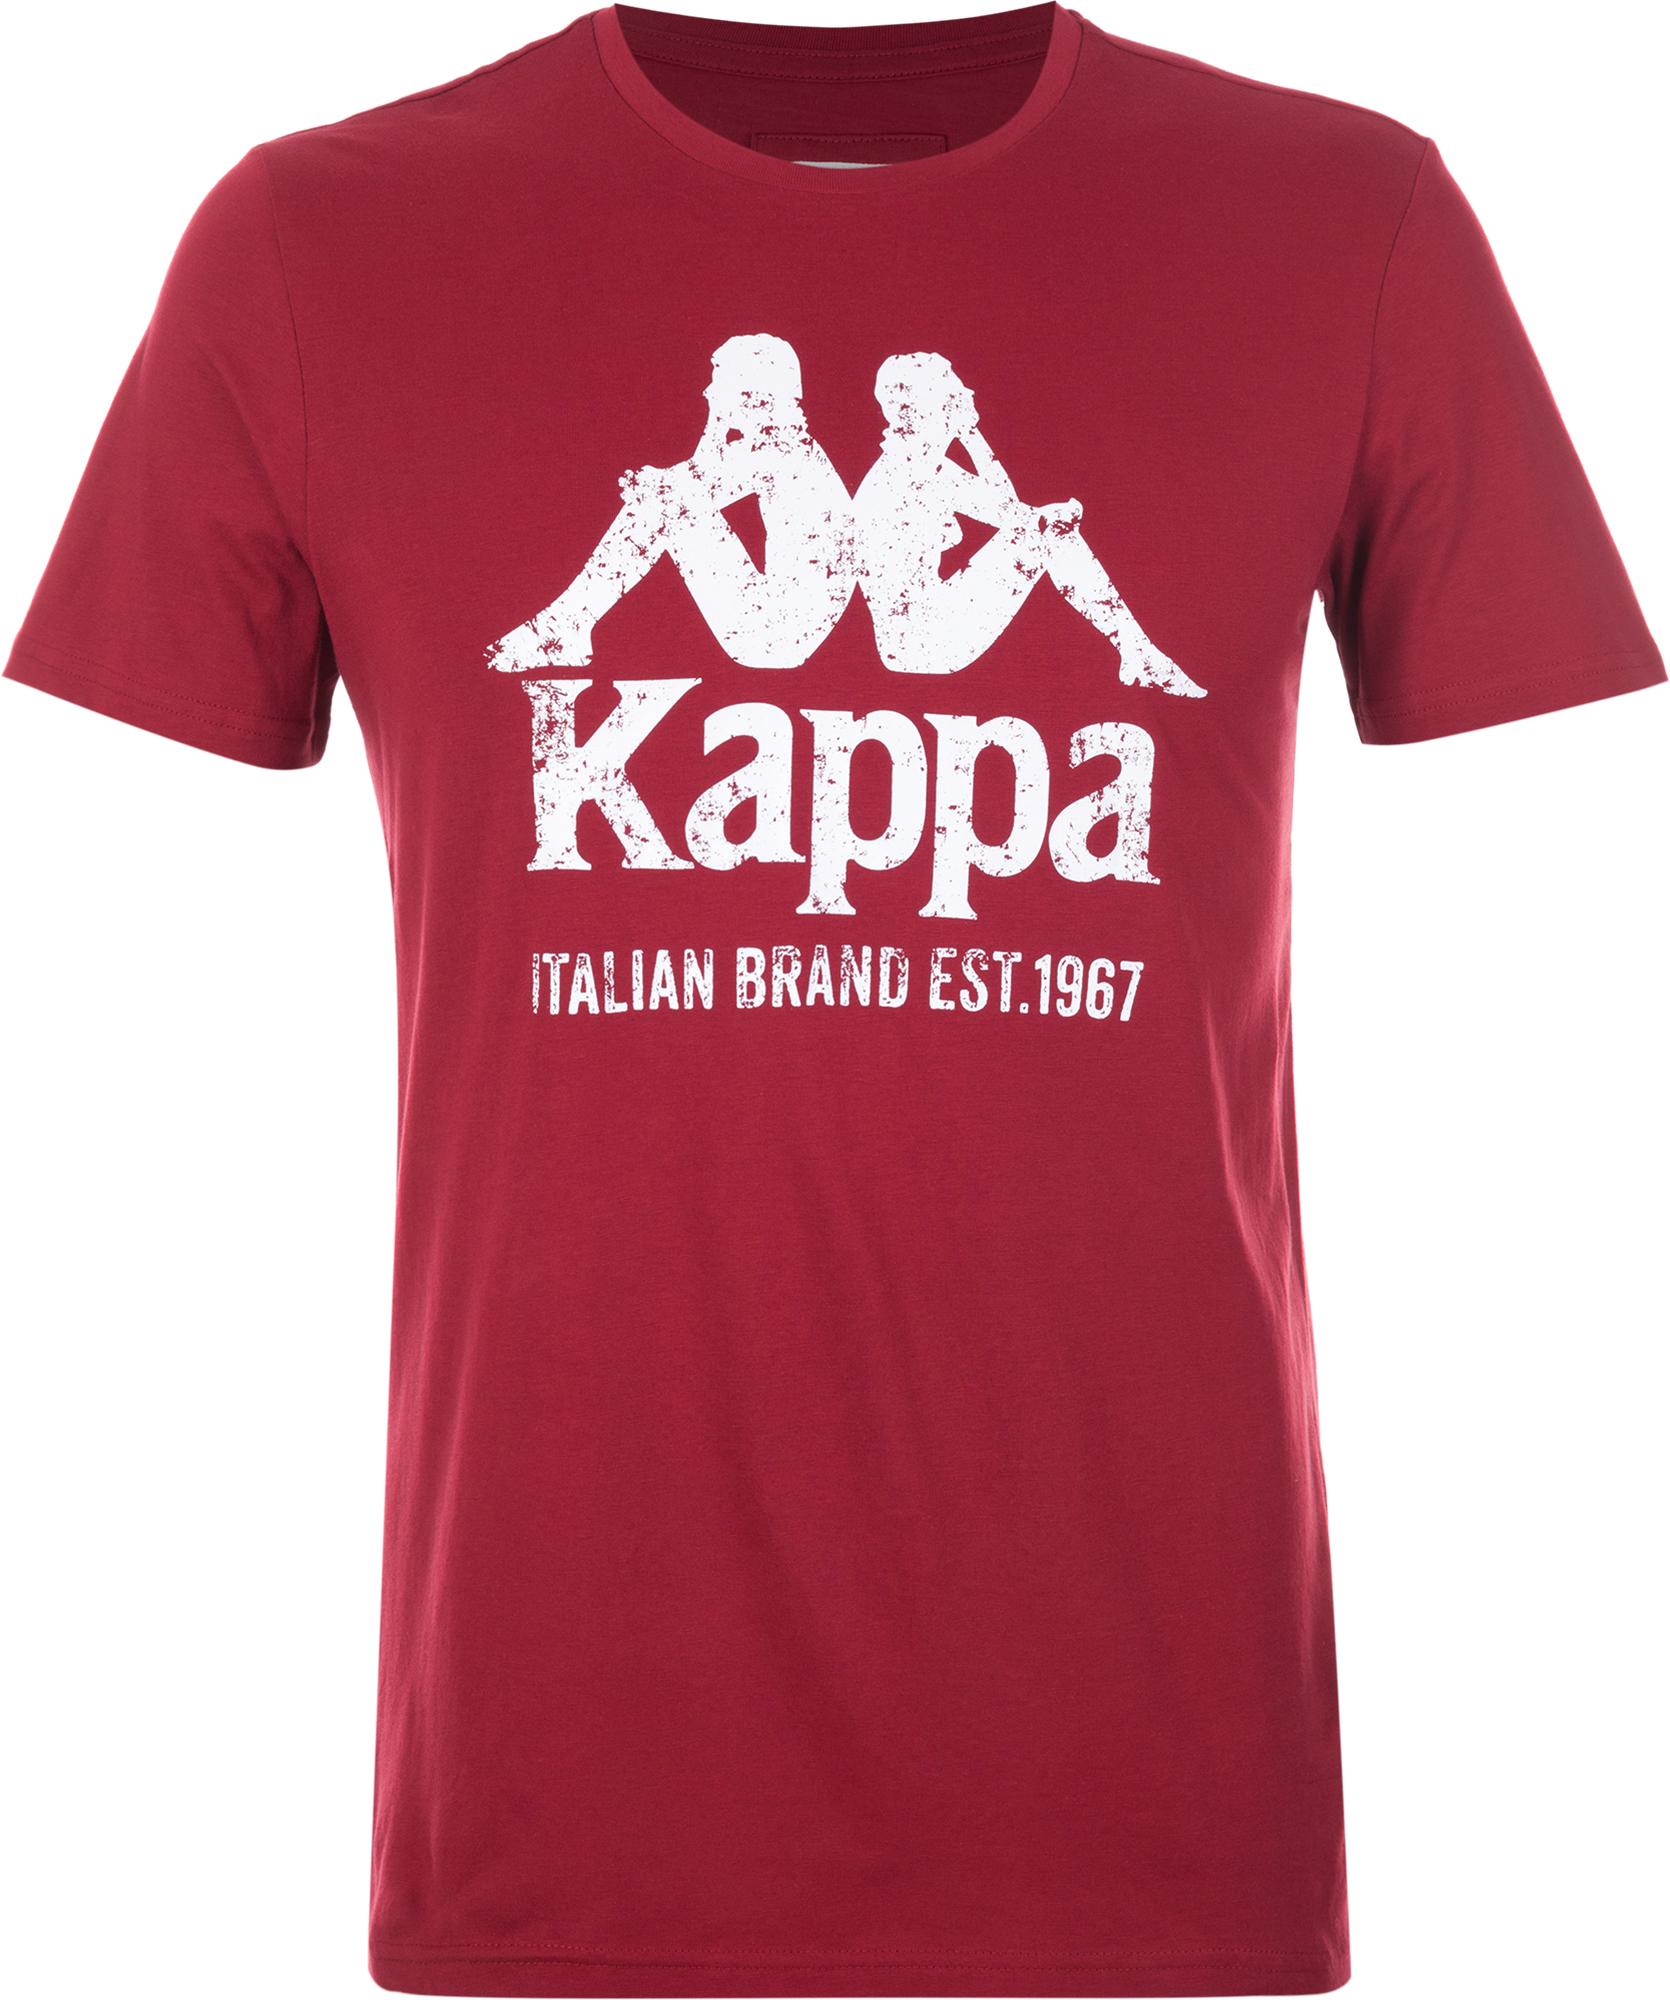 Kappa Футболка мужская Kappa, размер 52